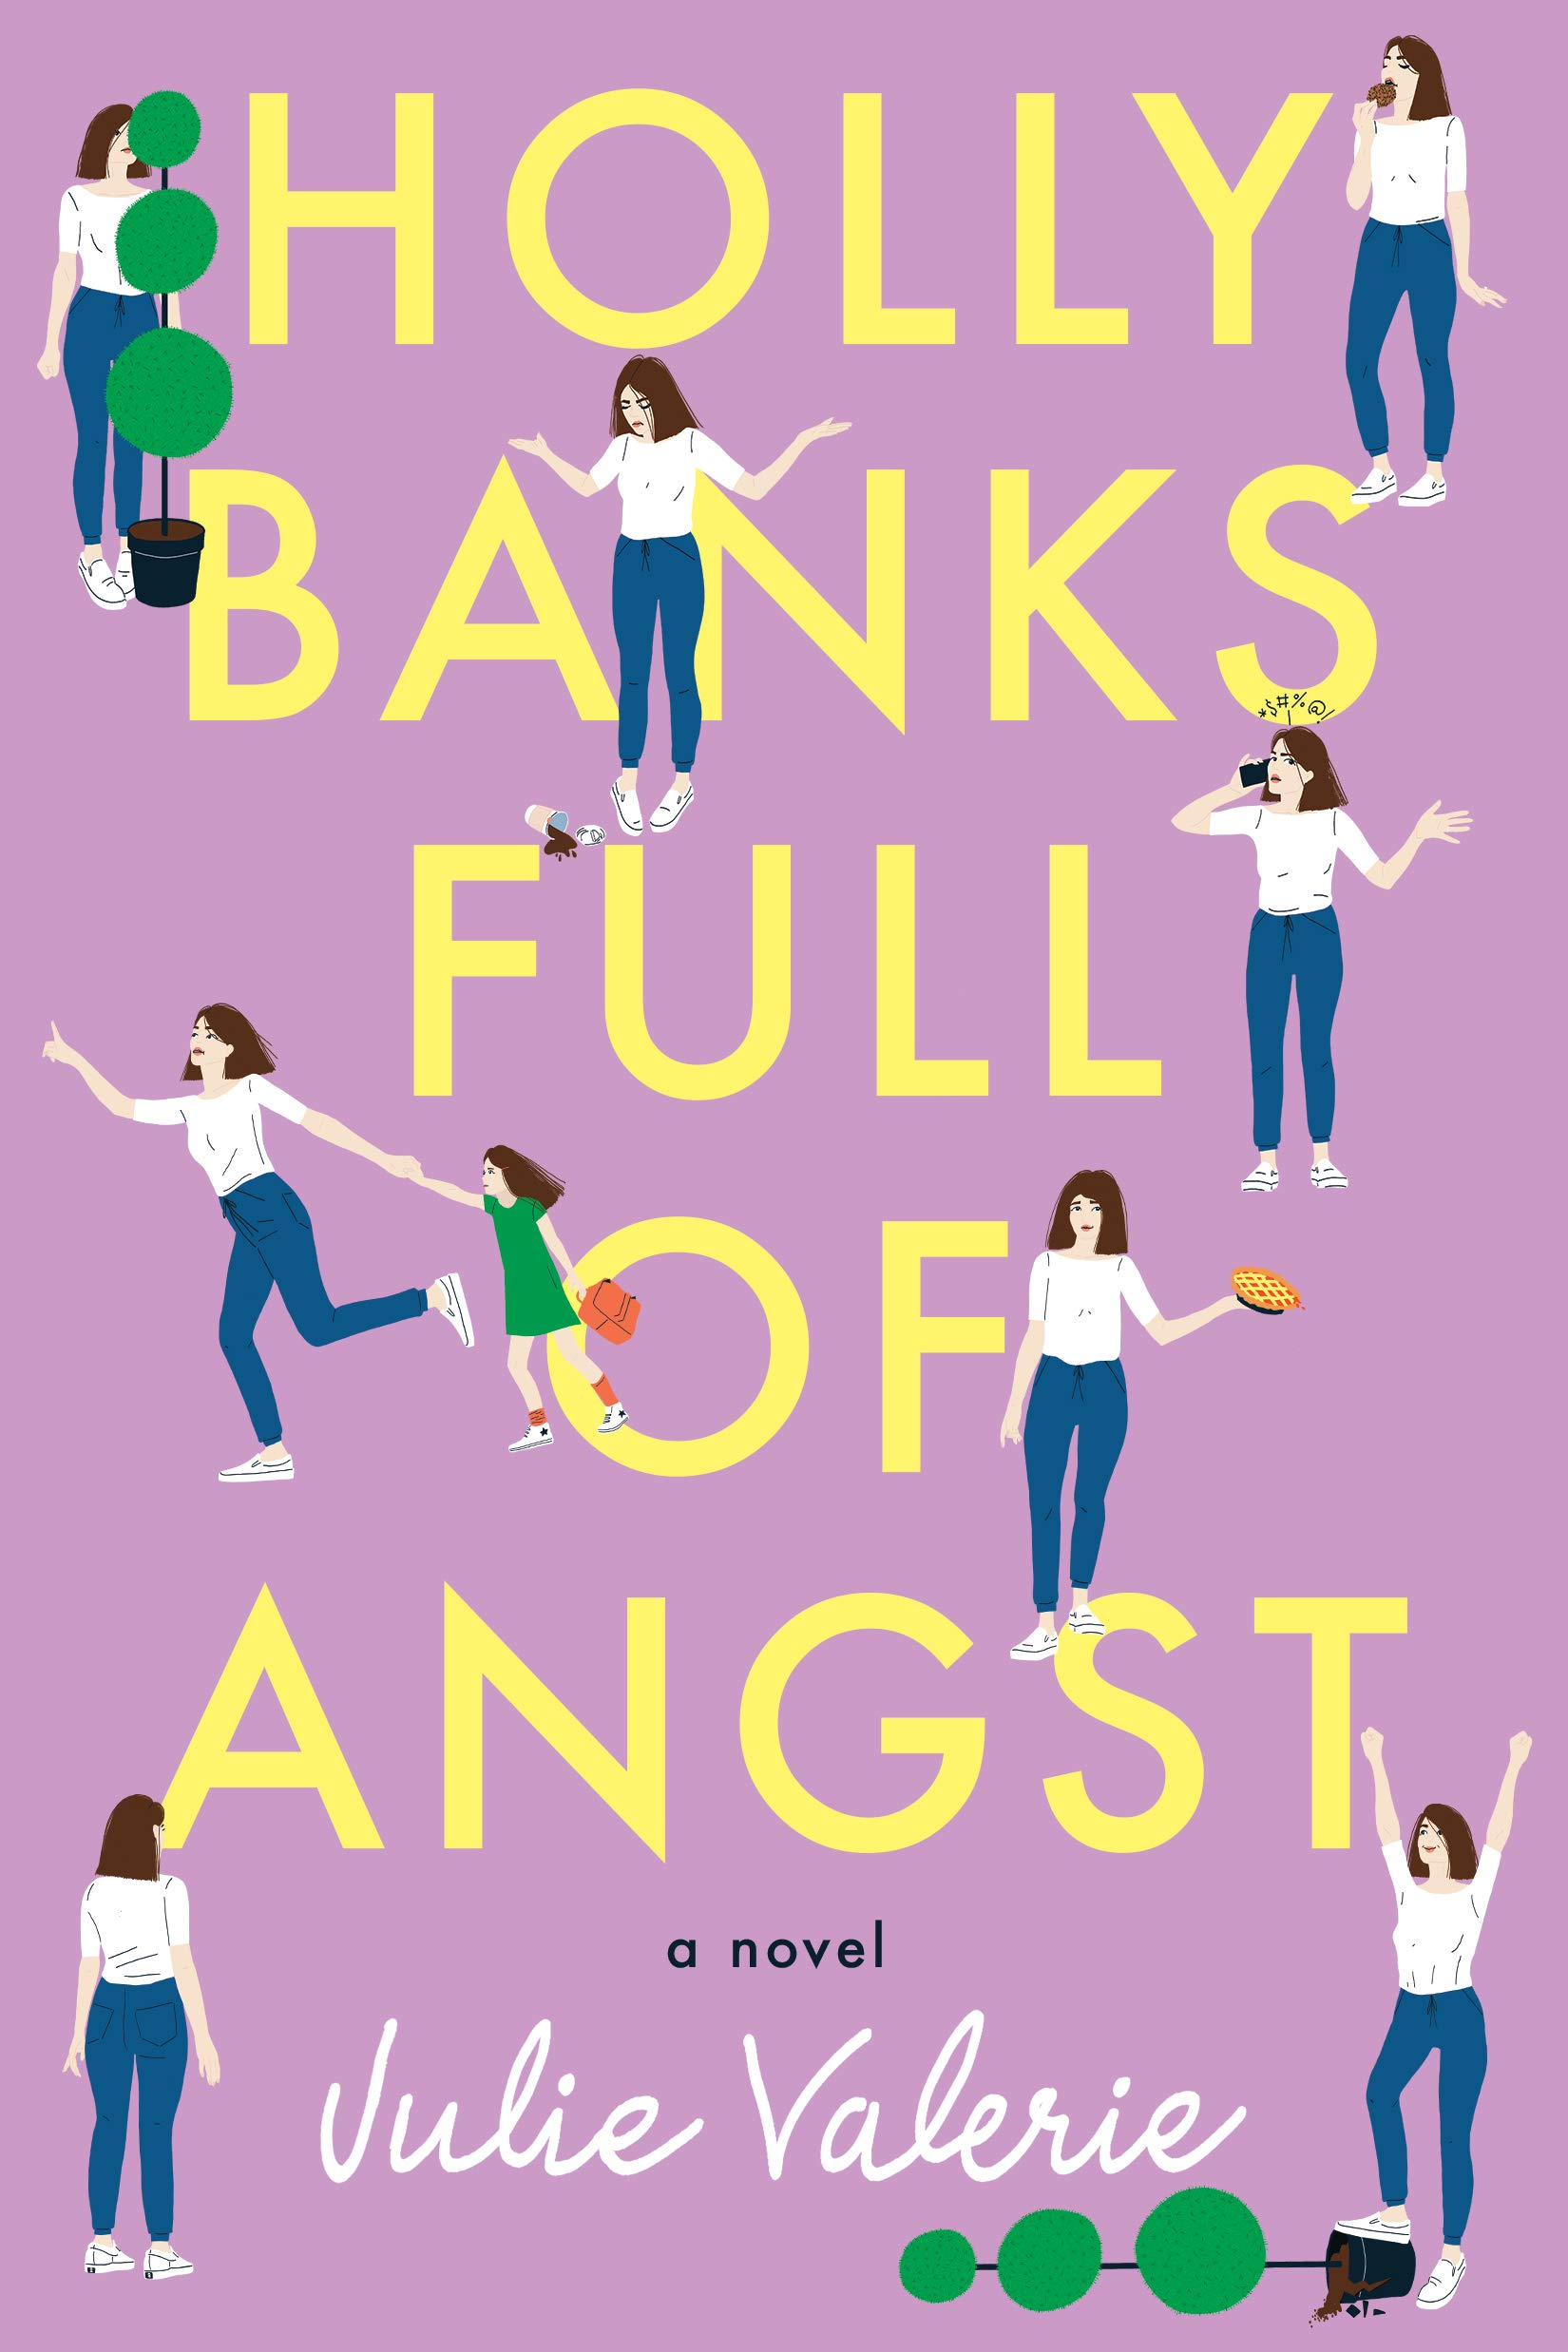 Holly Banks Full of Angst (Village of Primm): Amazon.es: Valerie, Julie: Libros en idiomas extranjeros